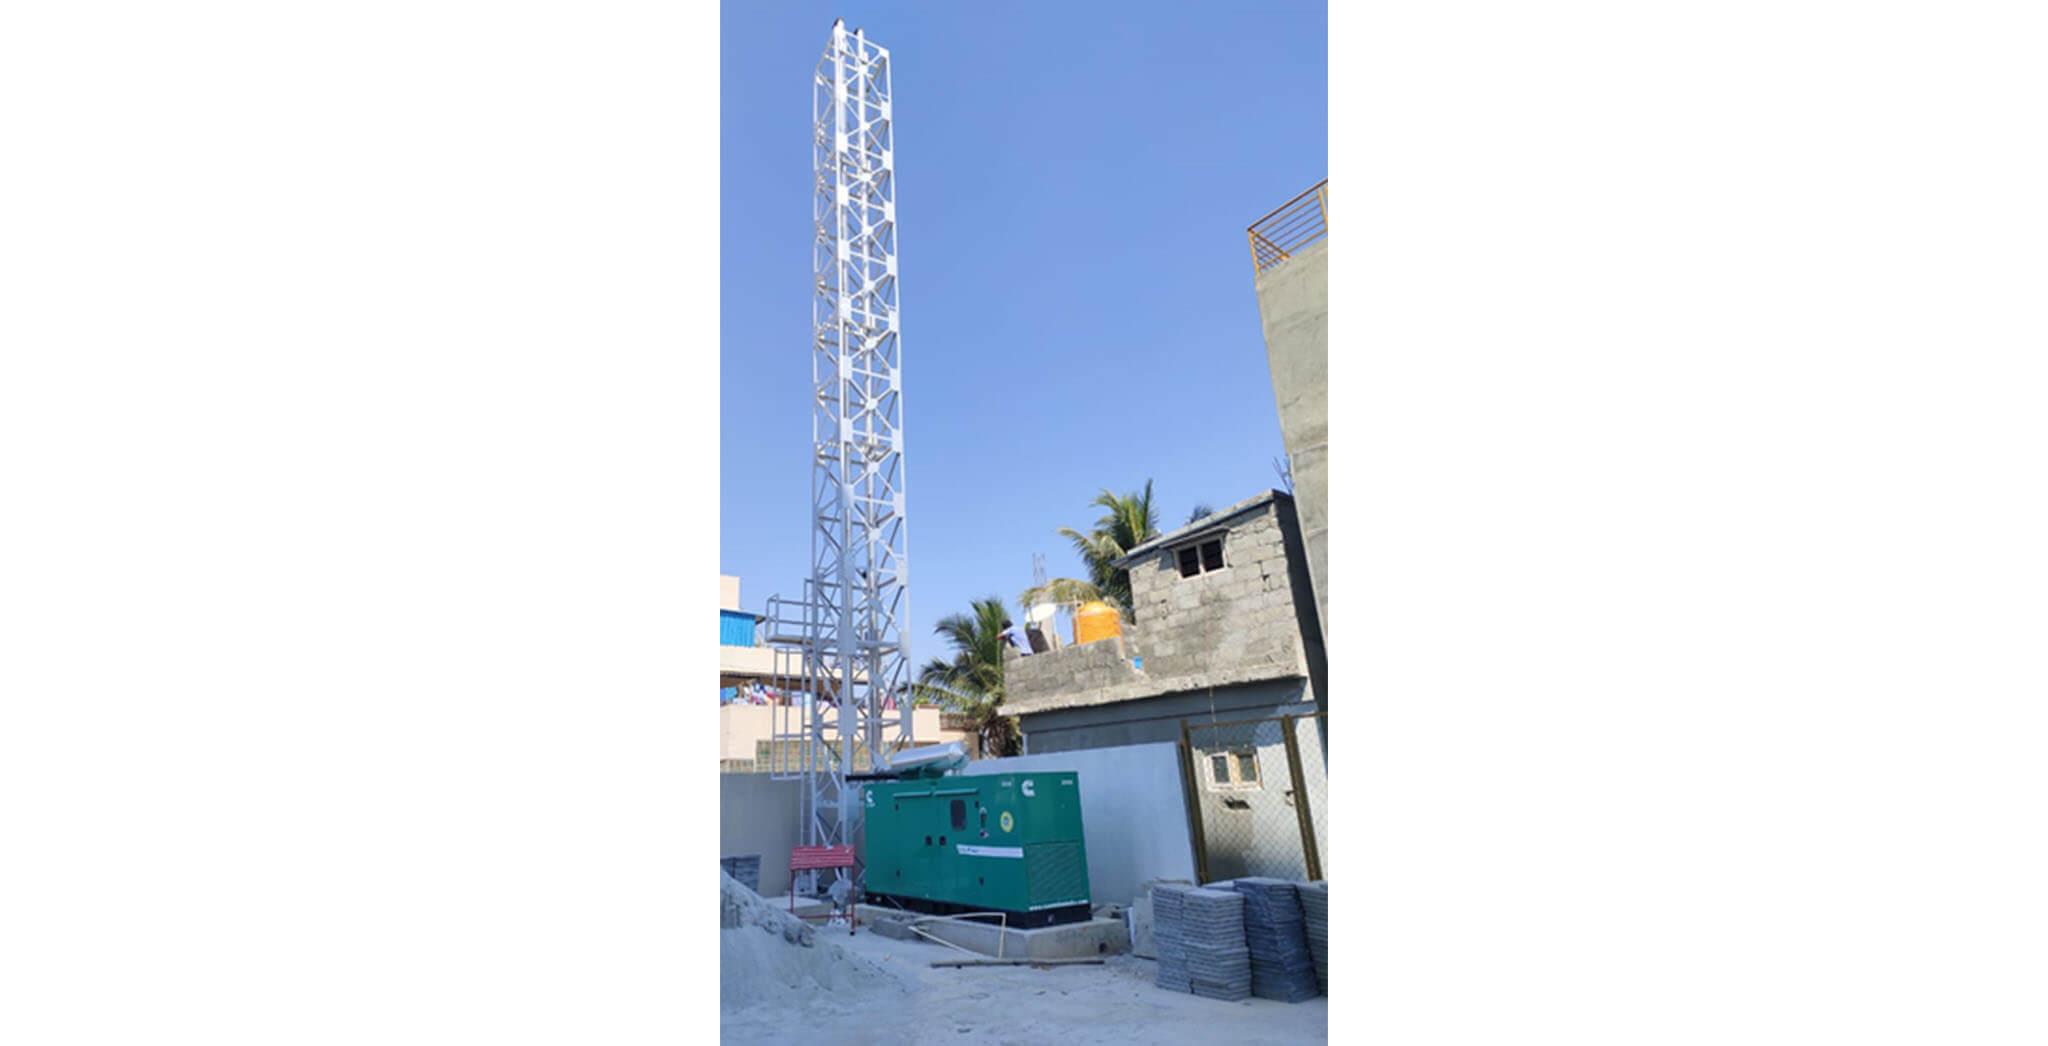 Feb 2021 - DG stack: Erection completed